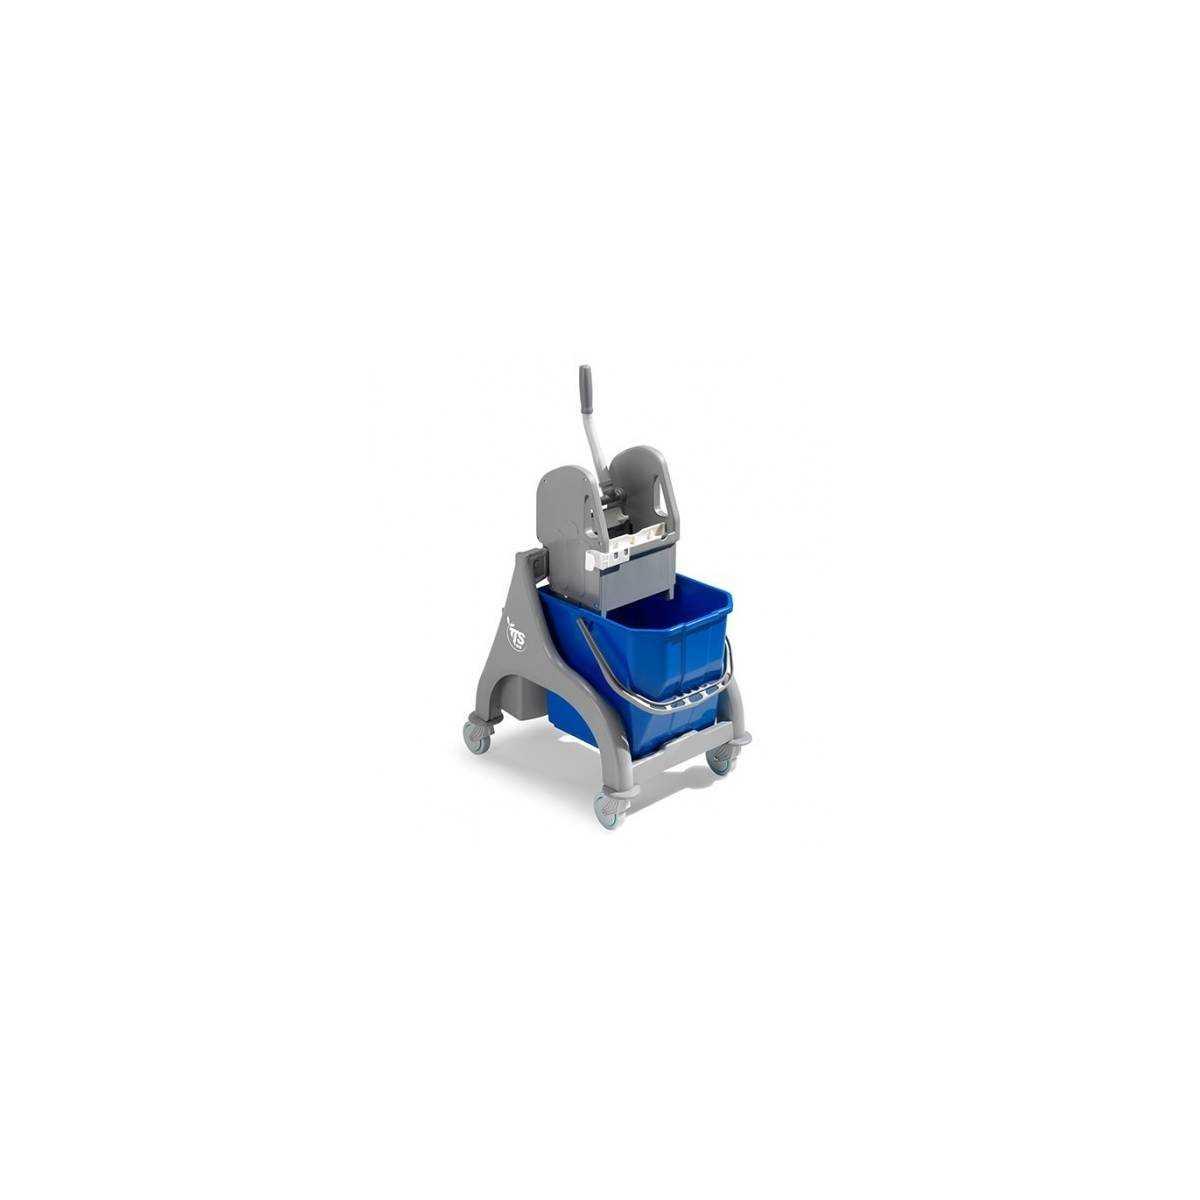 Тележка для уборки Nick 25L (6047) 6047 TTS